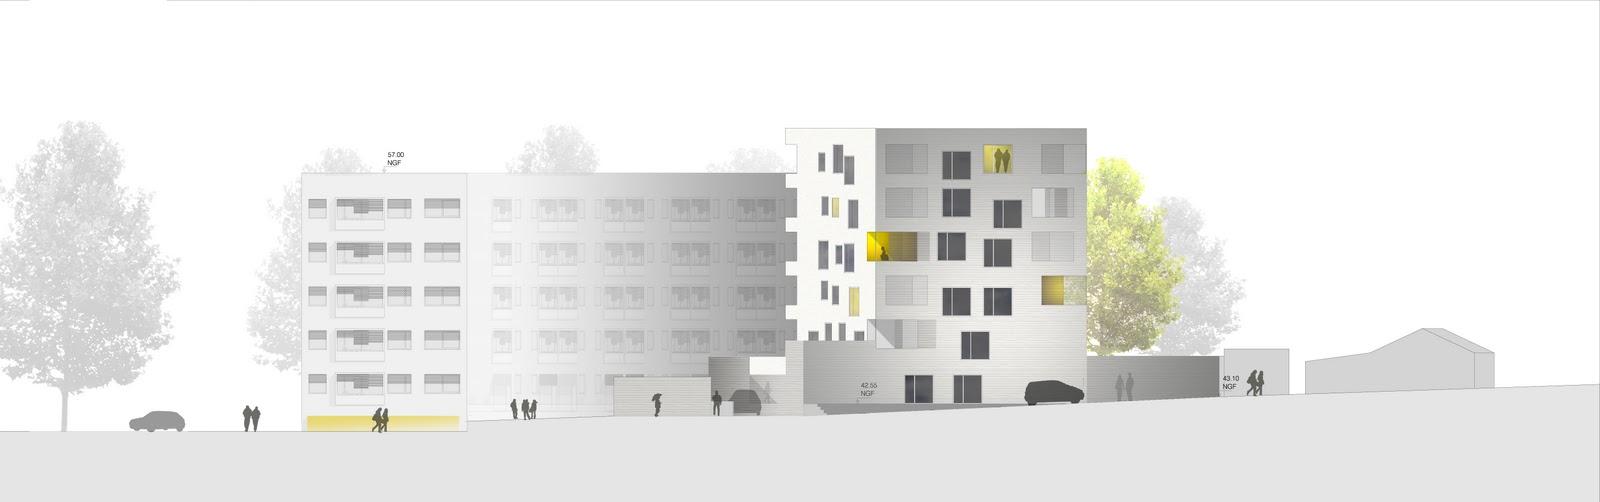 Plan Elevation Profil : Logements sociaux nantes bohuon bertic architectes